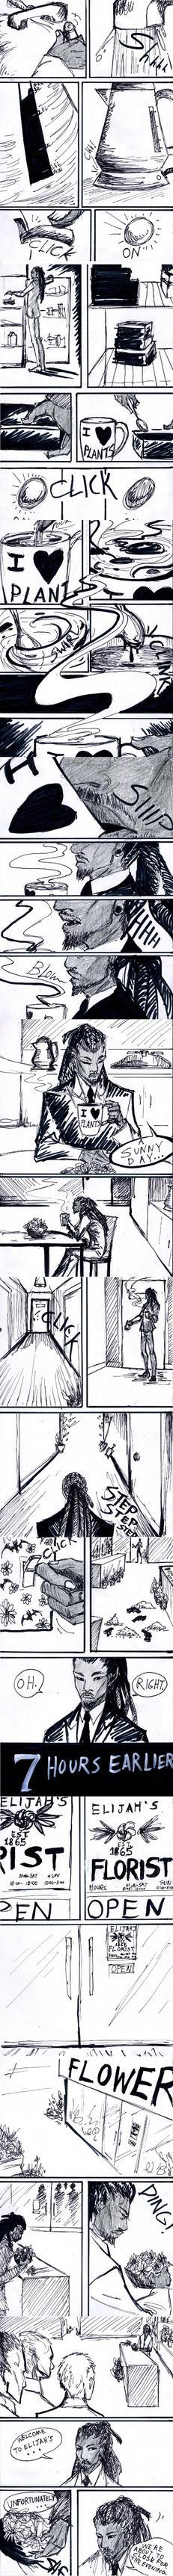 24 Hr Comic 2014 SET 2 by PhantomSeptember